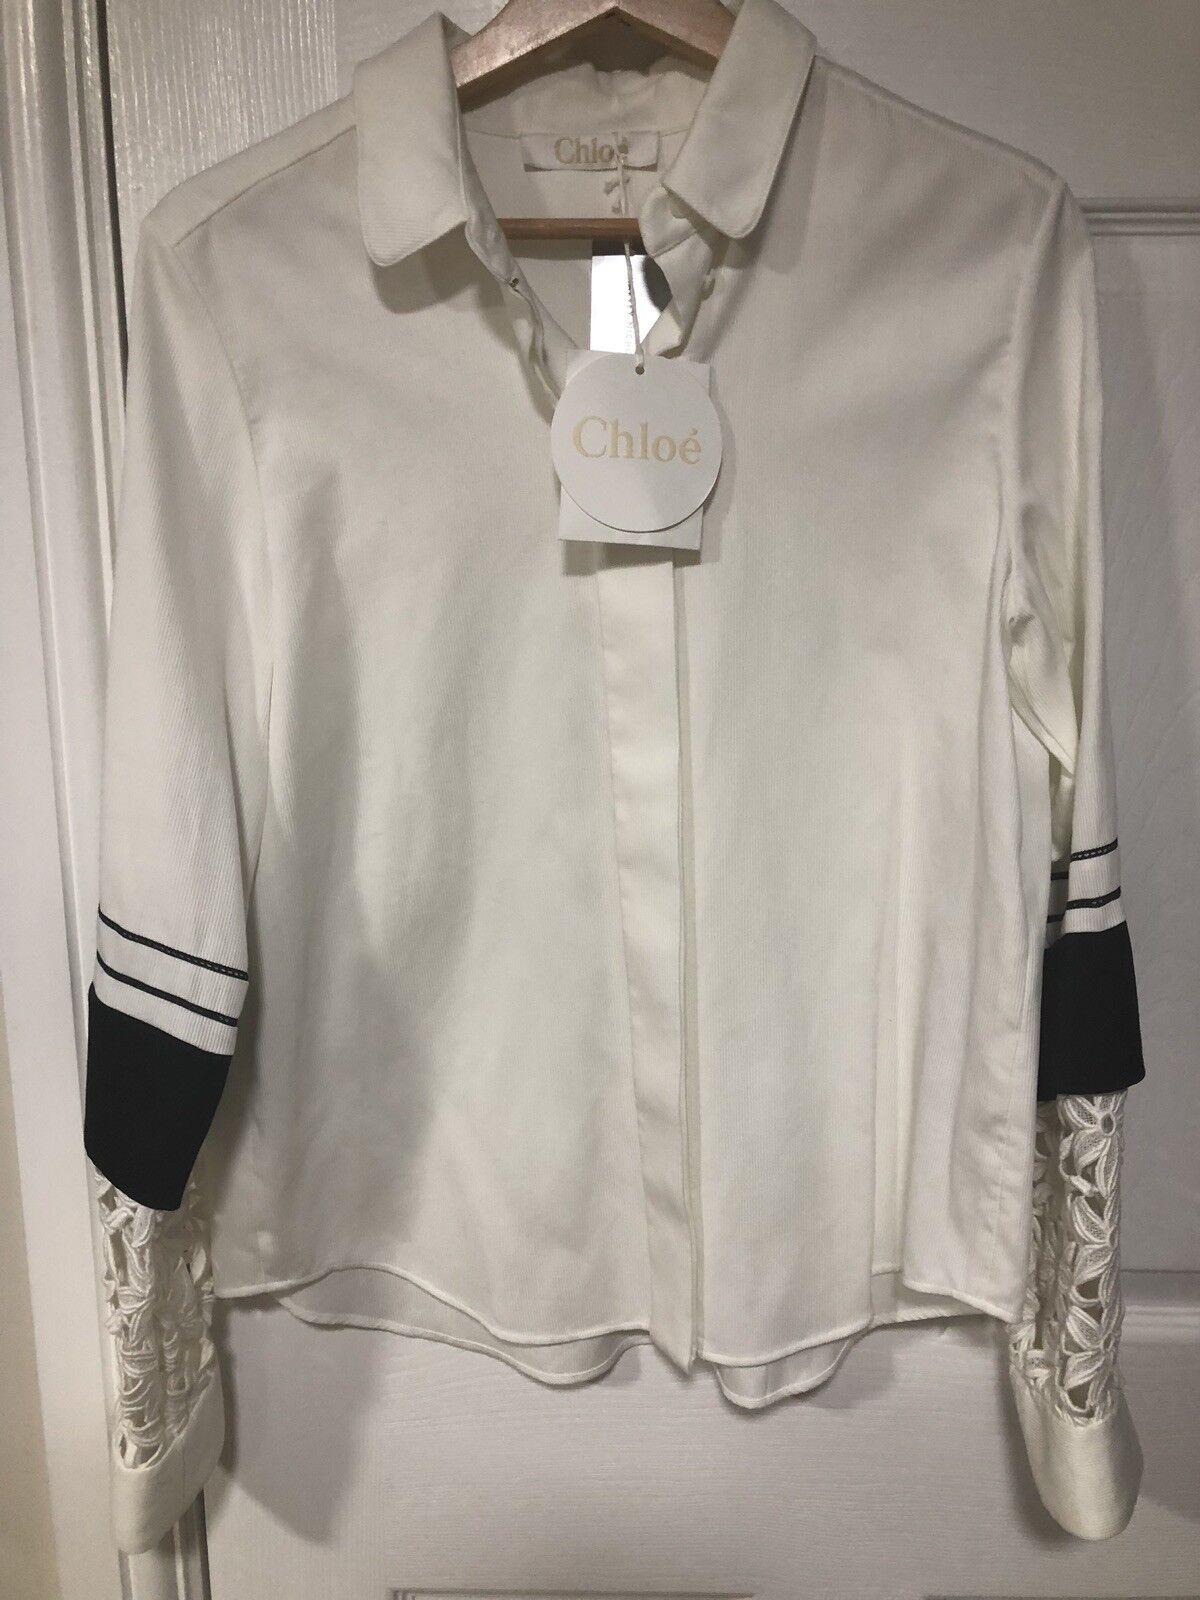 Chloe Shirt for damen new with tag Weiß and schwarz Größe 40